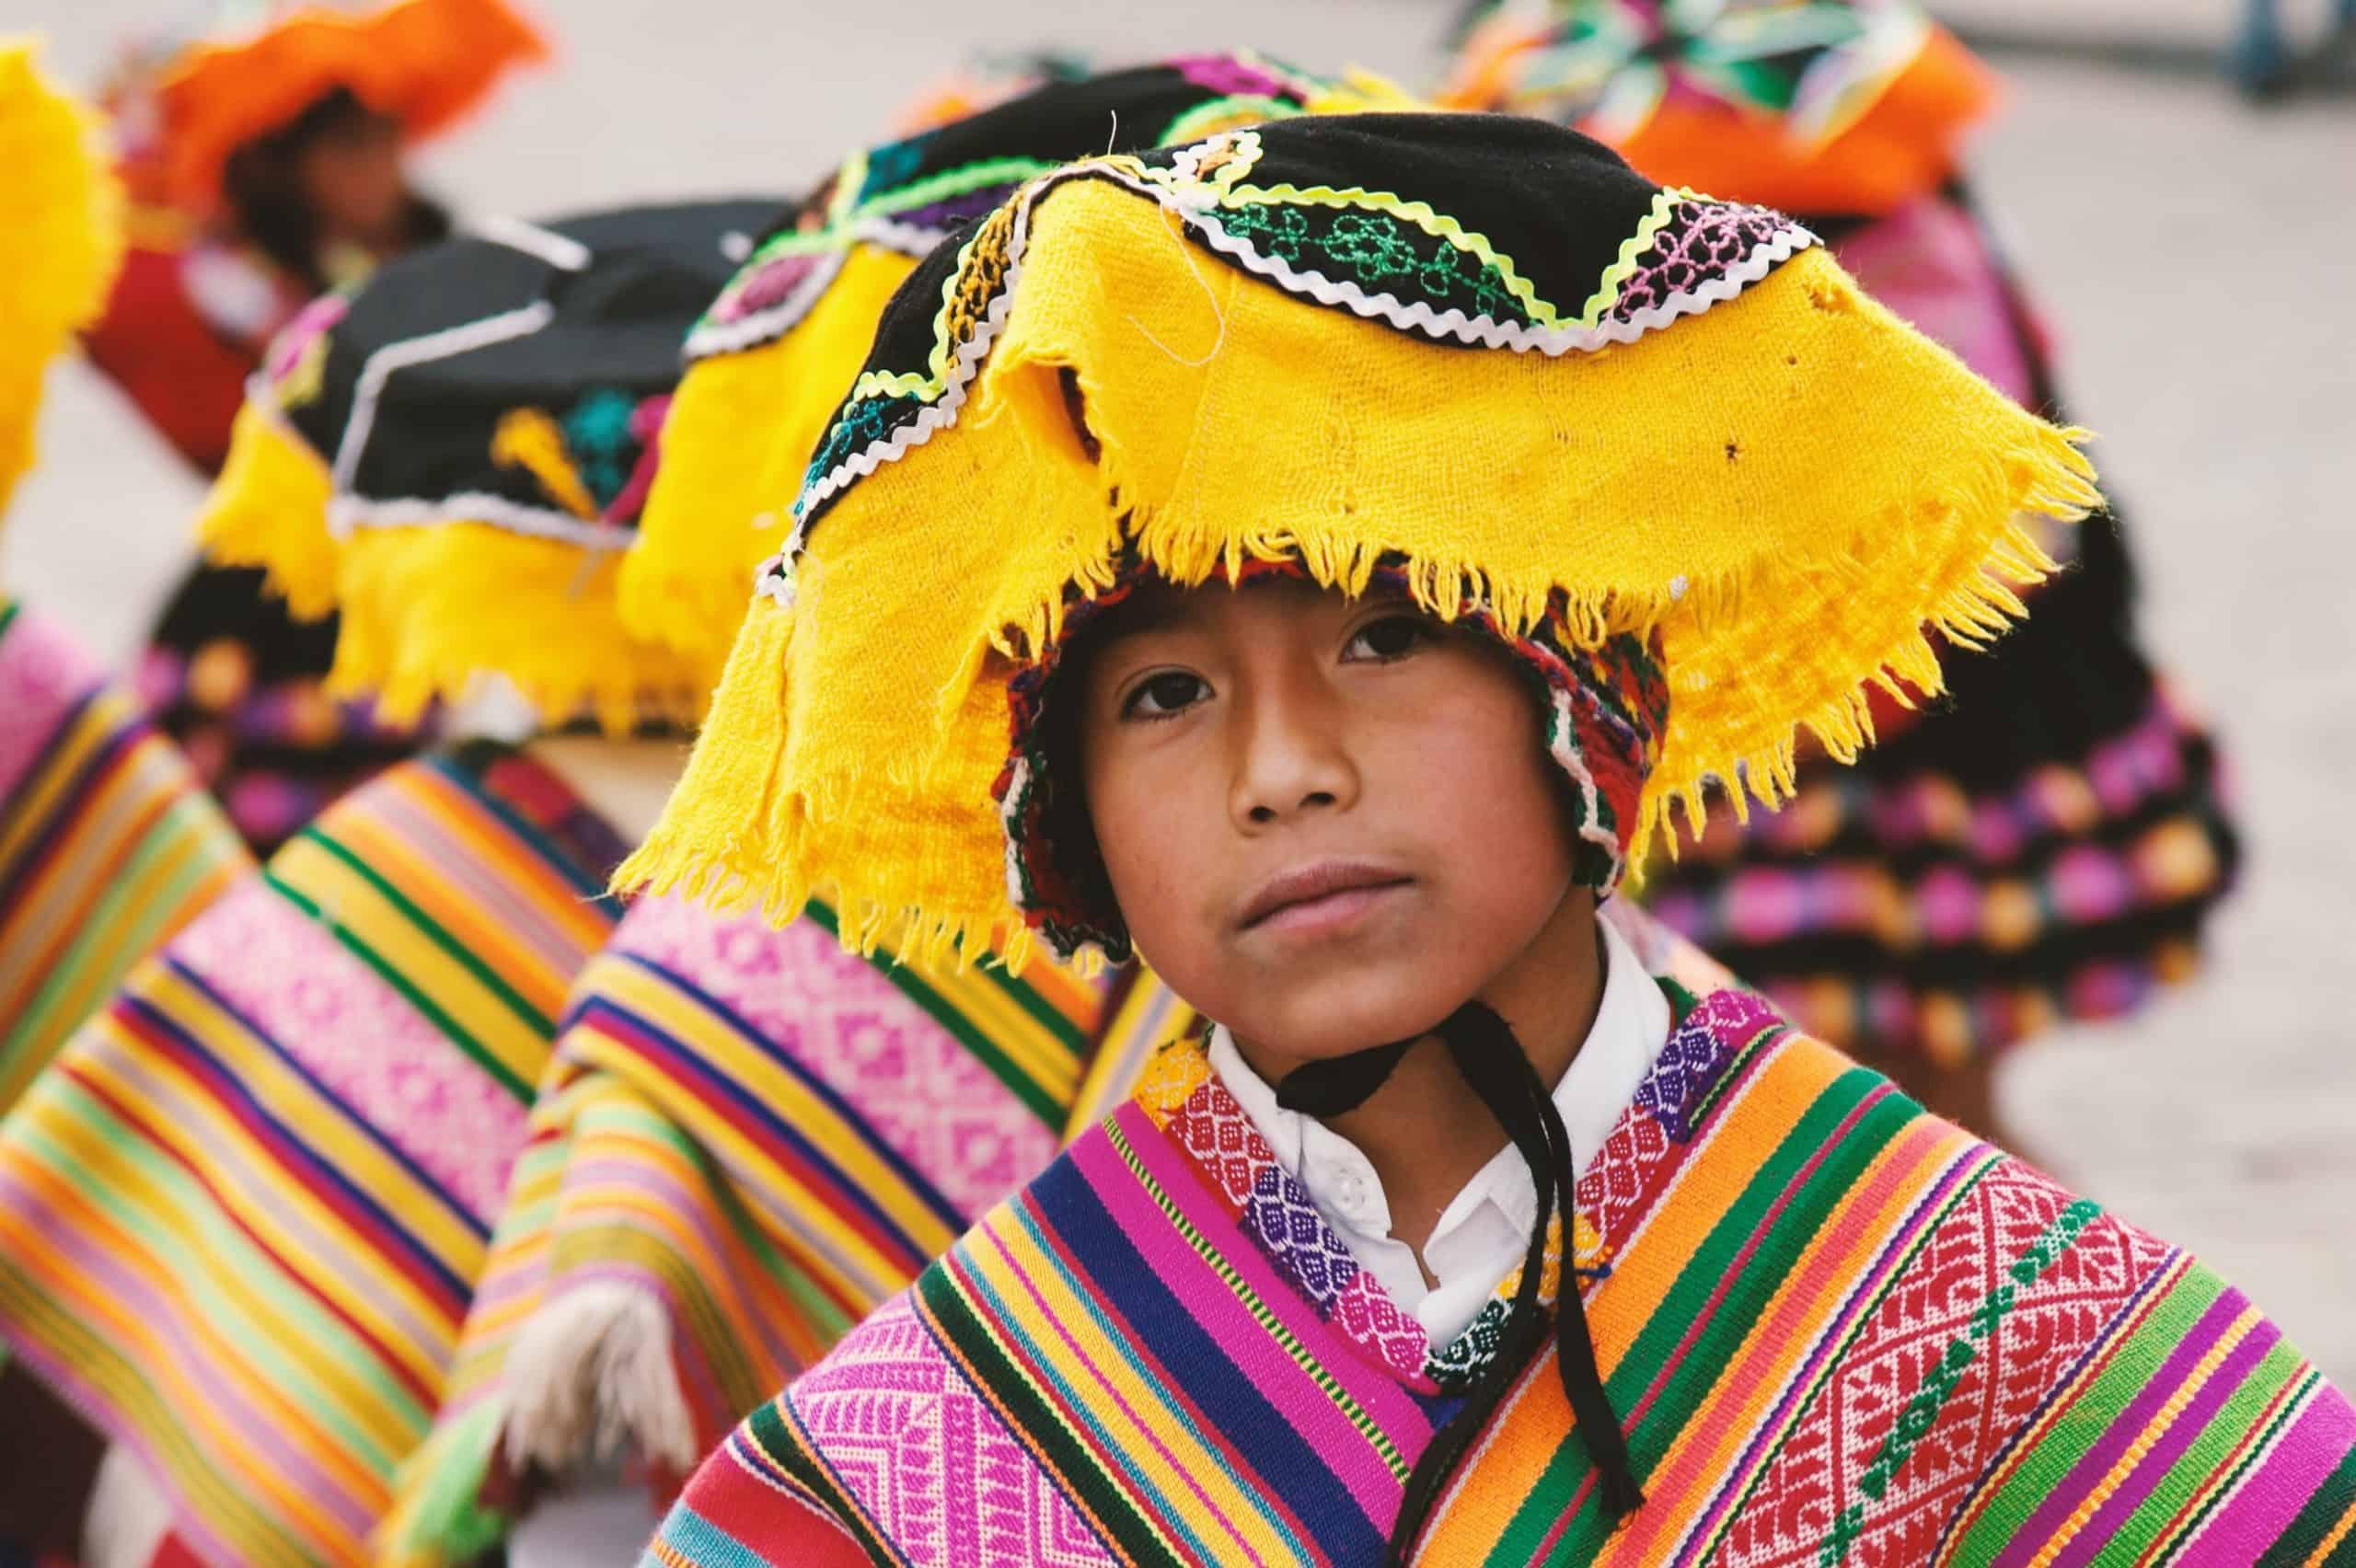 support indigenous communities